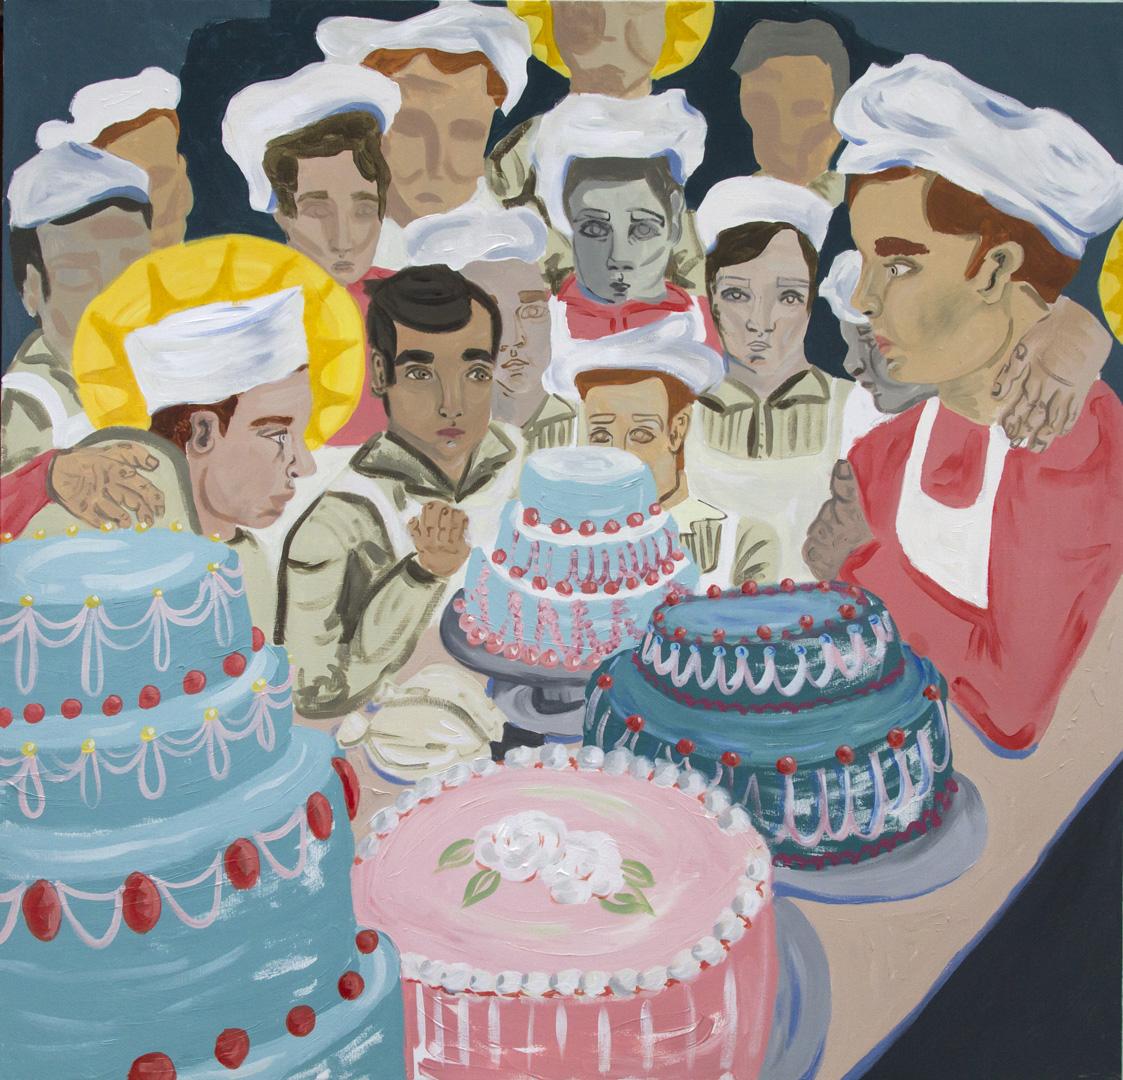 SAINTS DECORATING CAKES, 2014